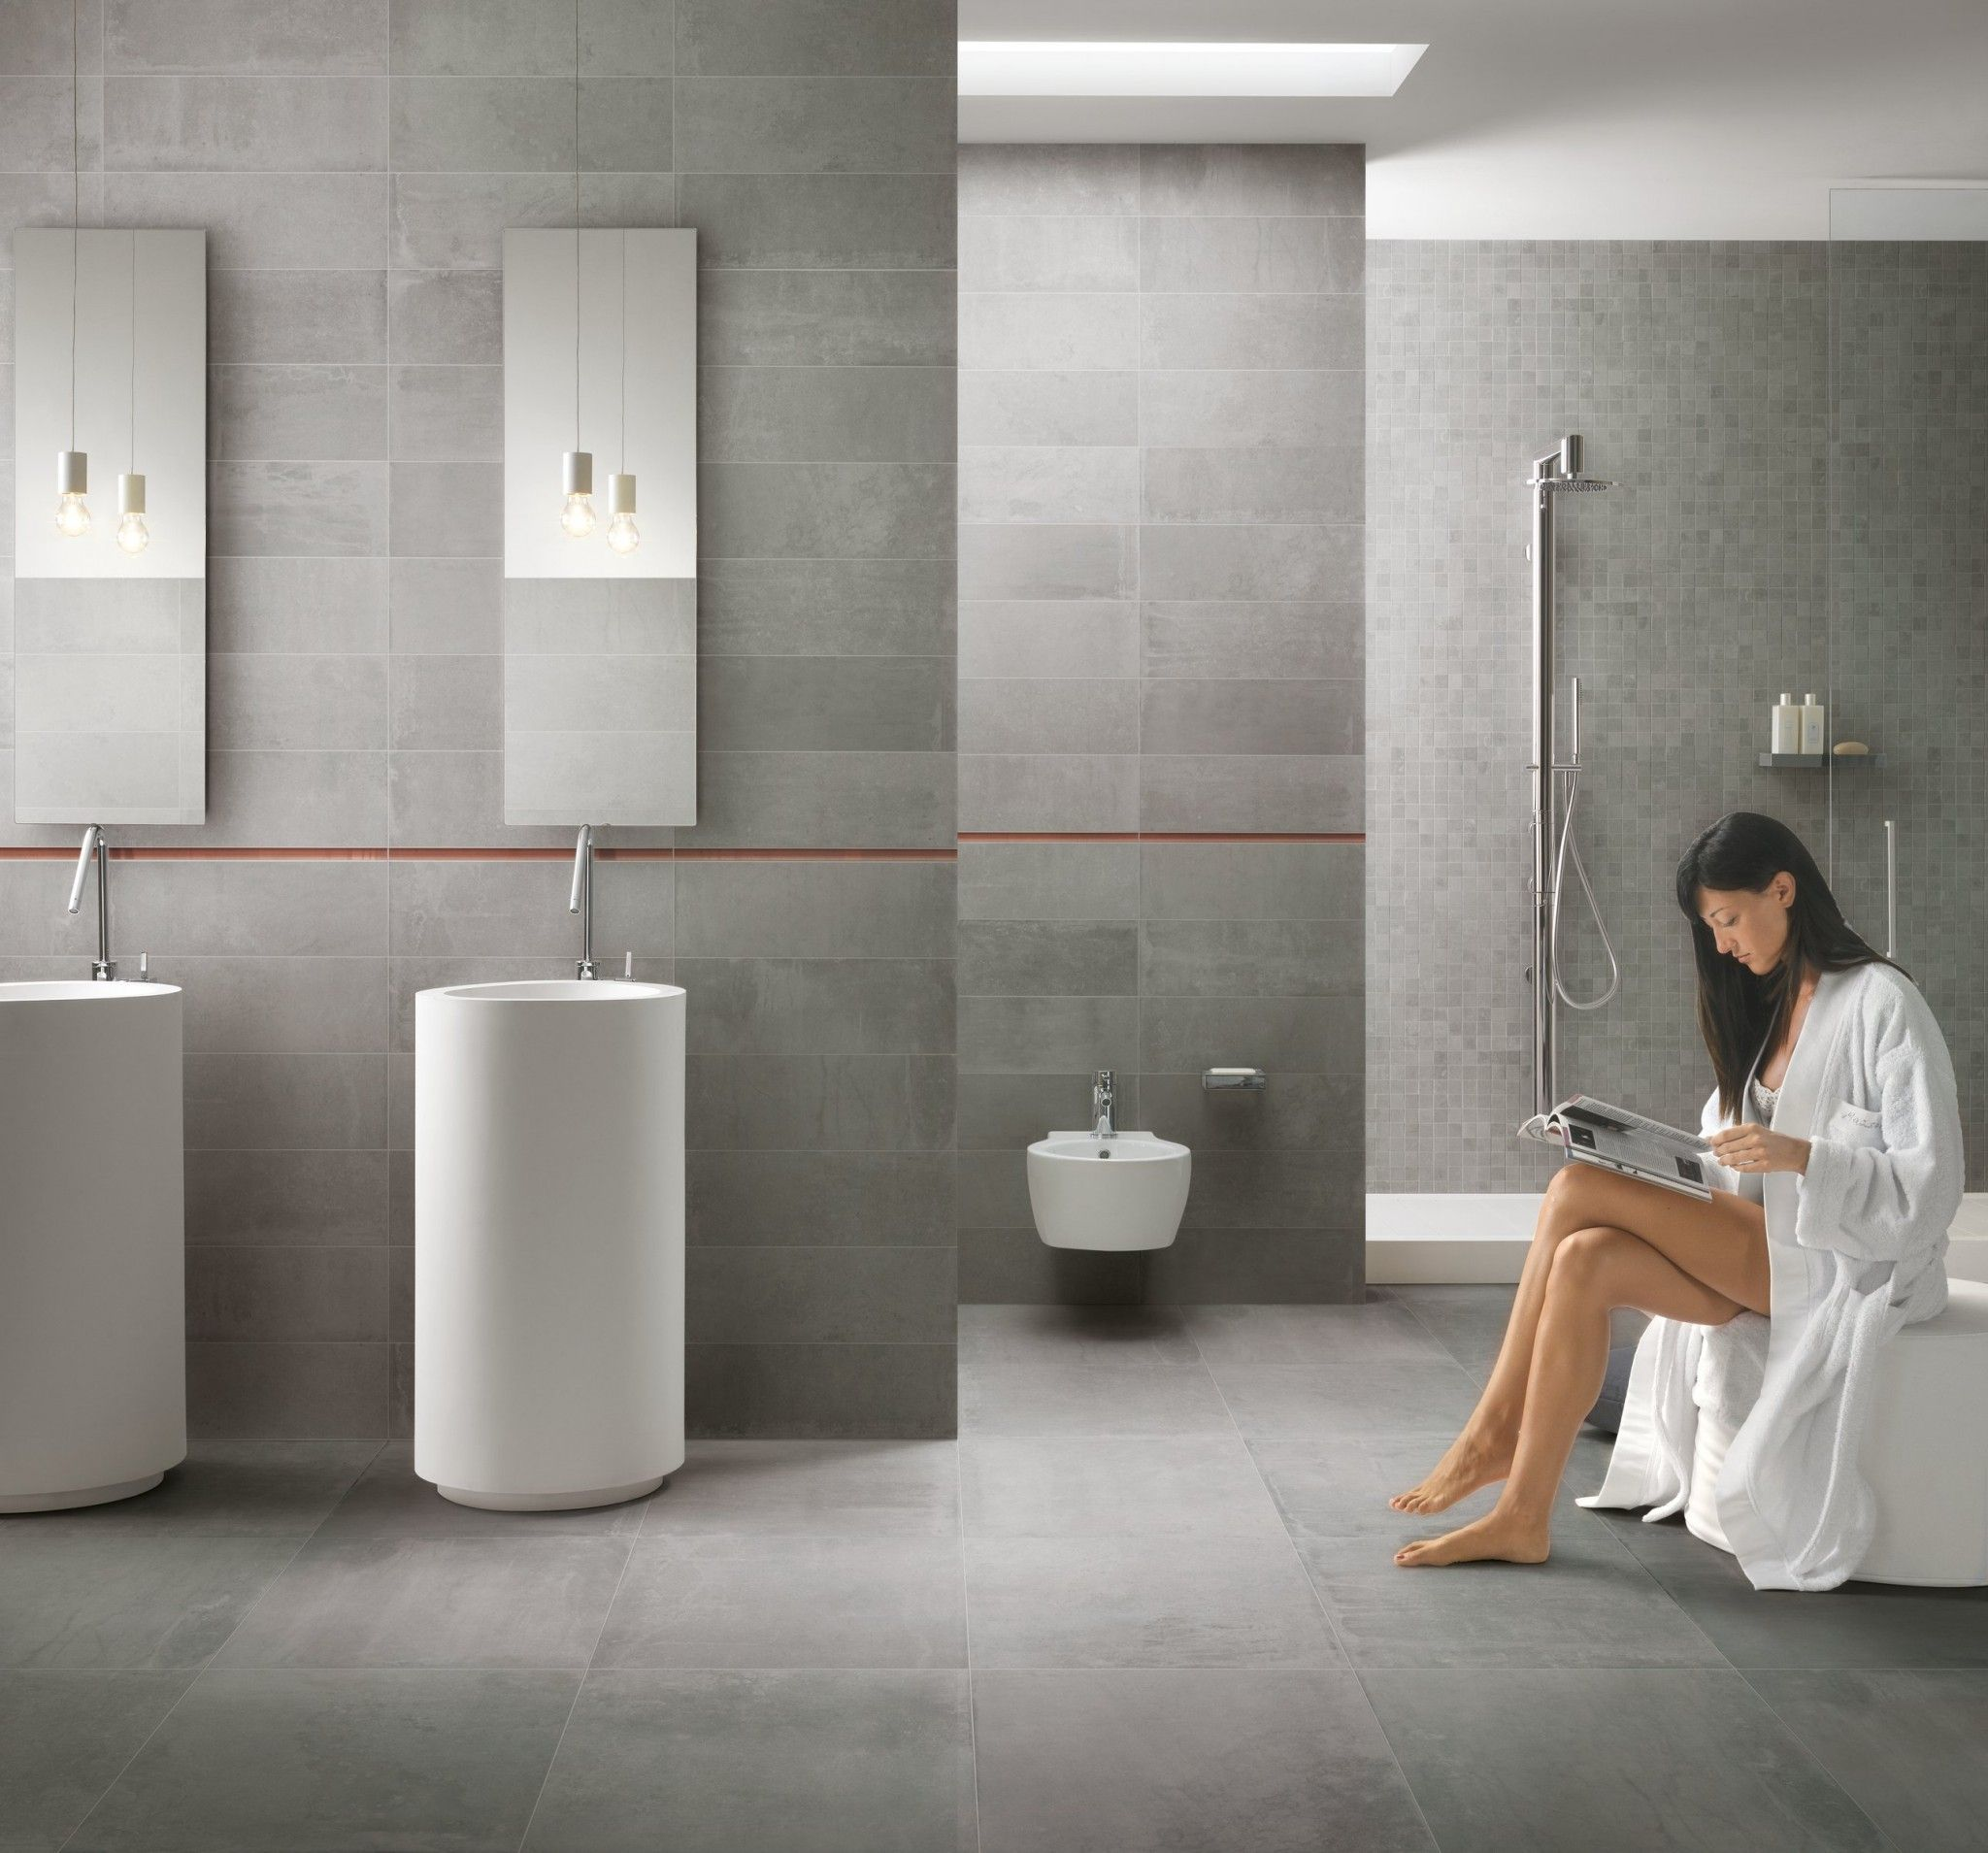 badkamertegels gilbo tegels badkamer pinterest tegels